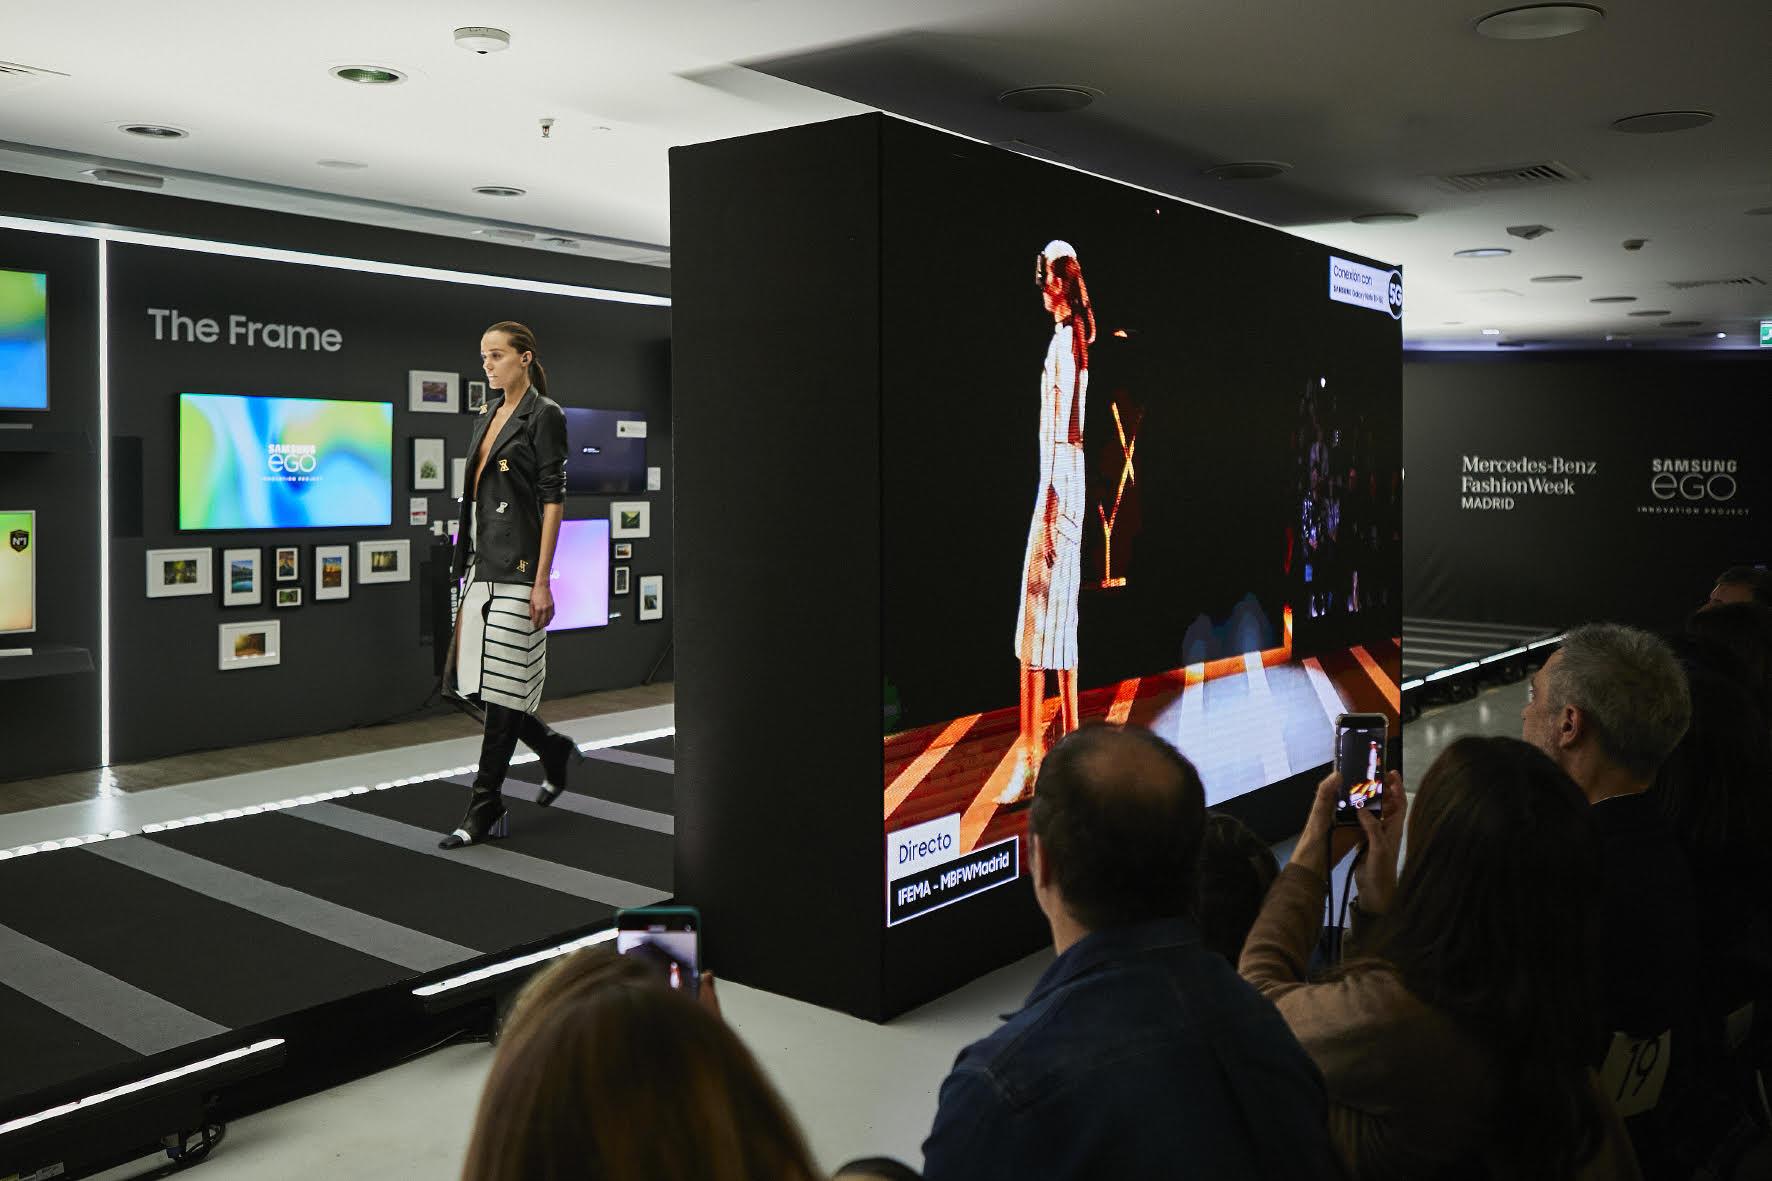 Samsung организовала модное дефиле на Mercedes-Benz Fashion Week в Мадриде